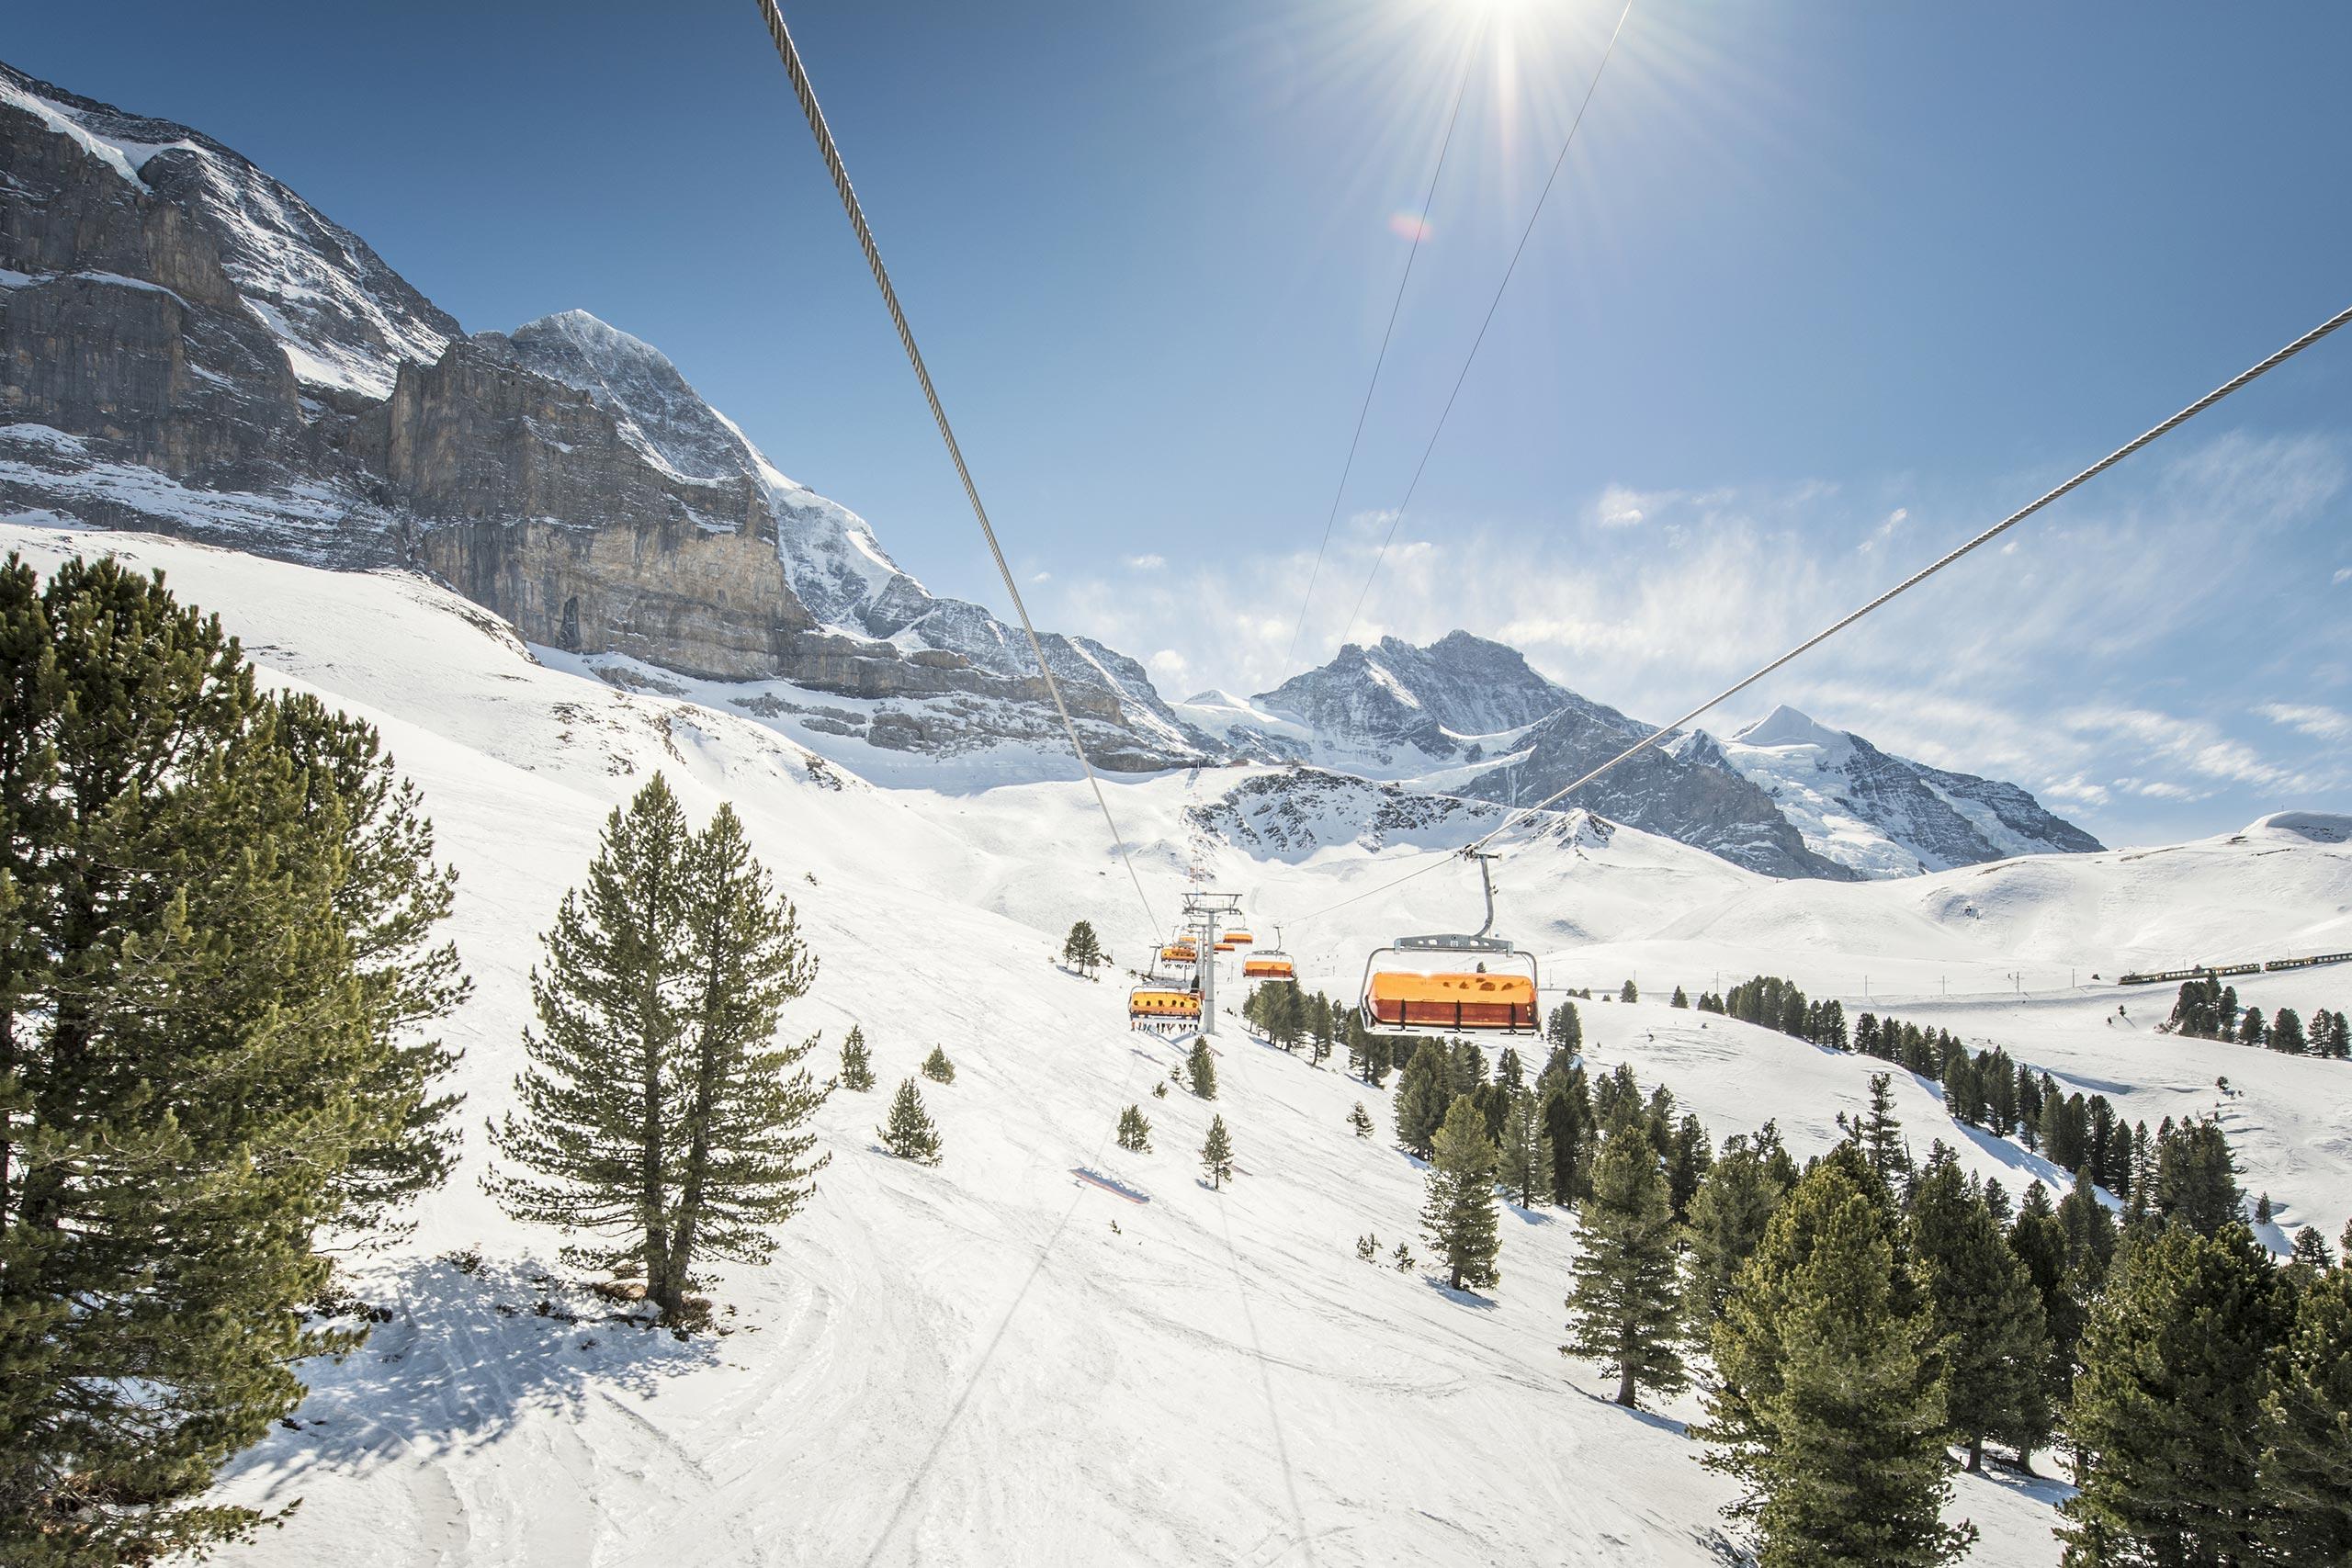 jungfrau-ski-region-sesselbahn-winter-schnee.jpg